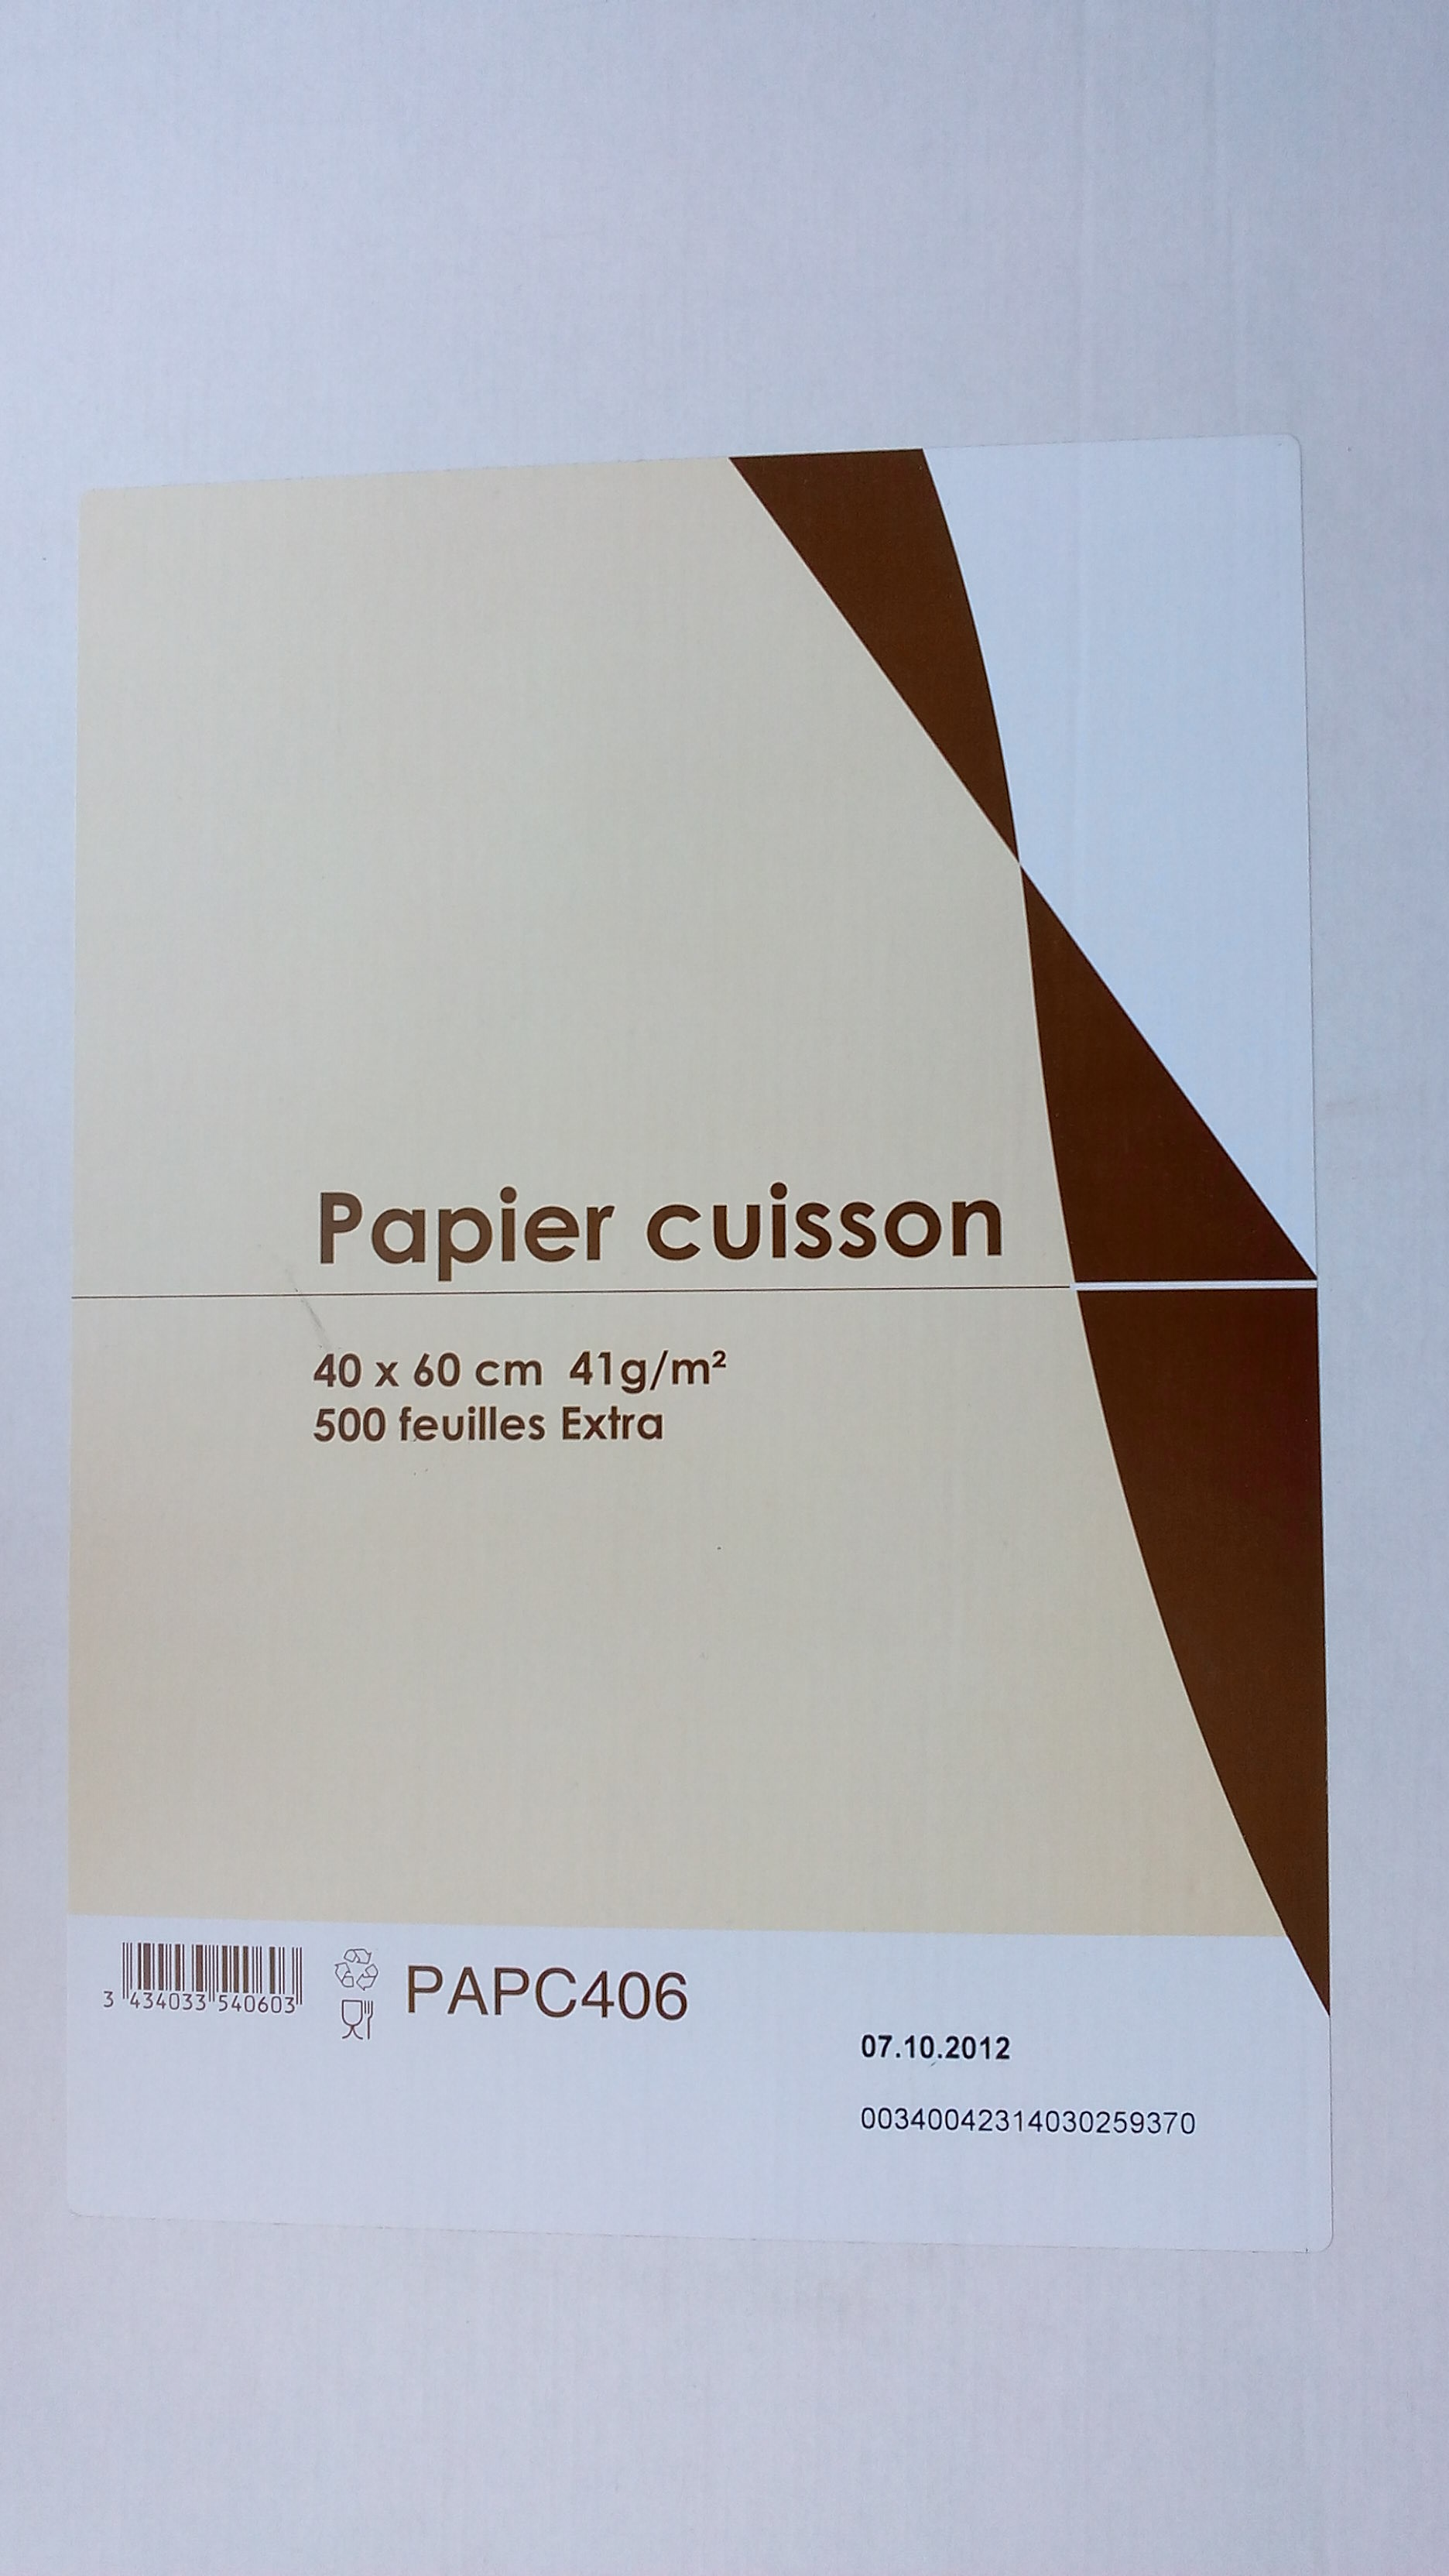 papier cuisson 40x60 41g x 500 alpes alimentaire distributions. Black Bedroom Furniture Sets. Home Design Ideas